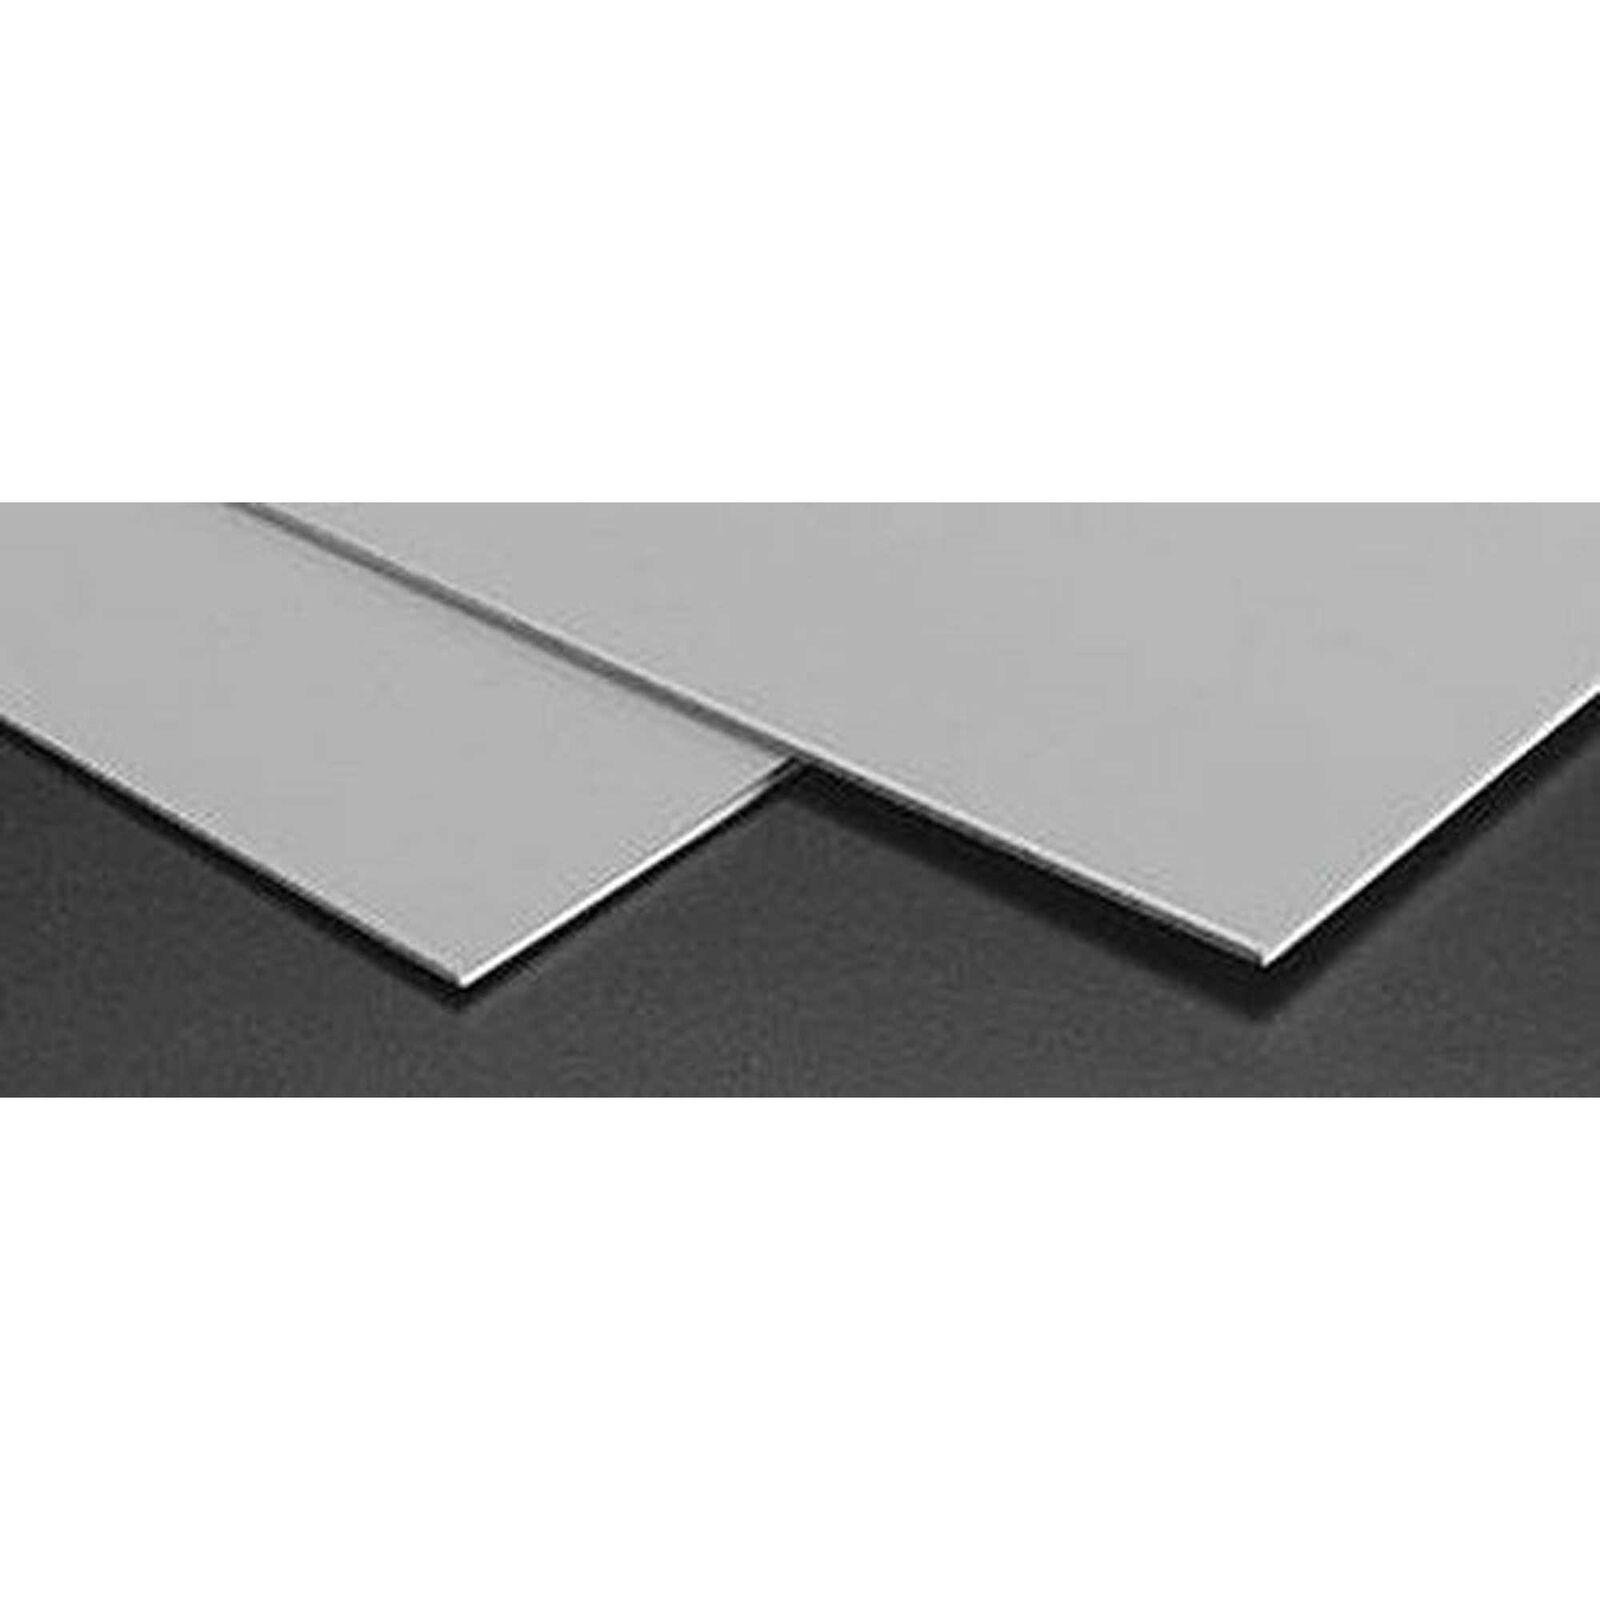 SSA-110 Gray ABS,.100 (2)